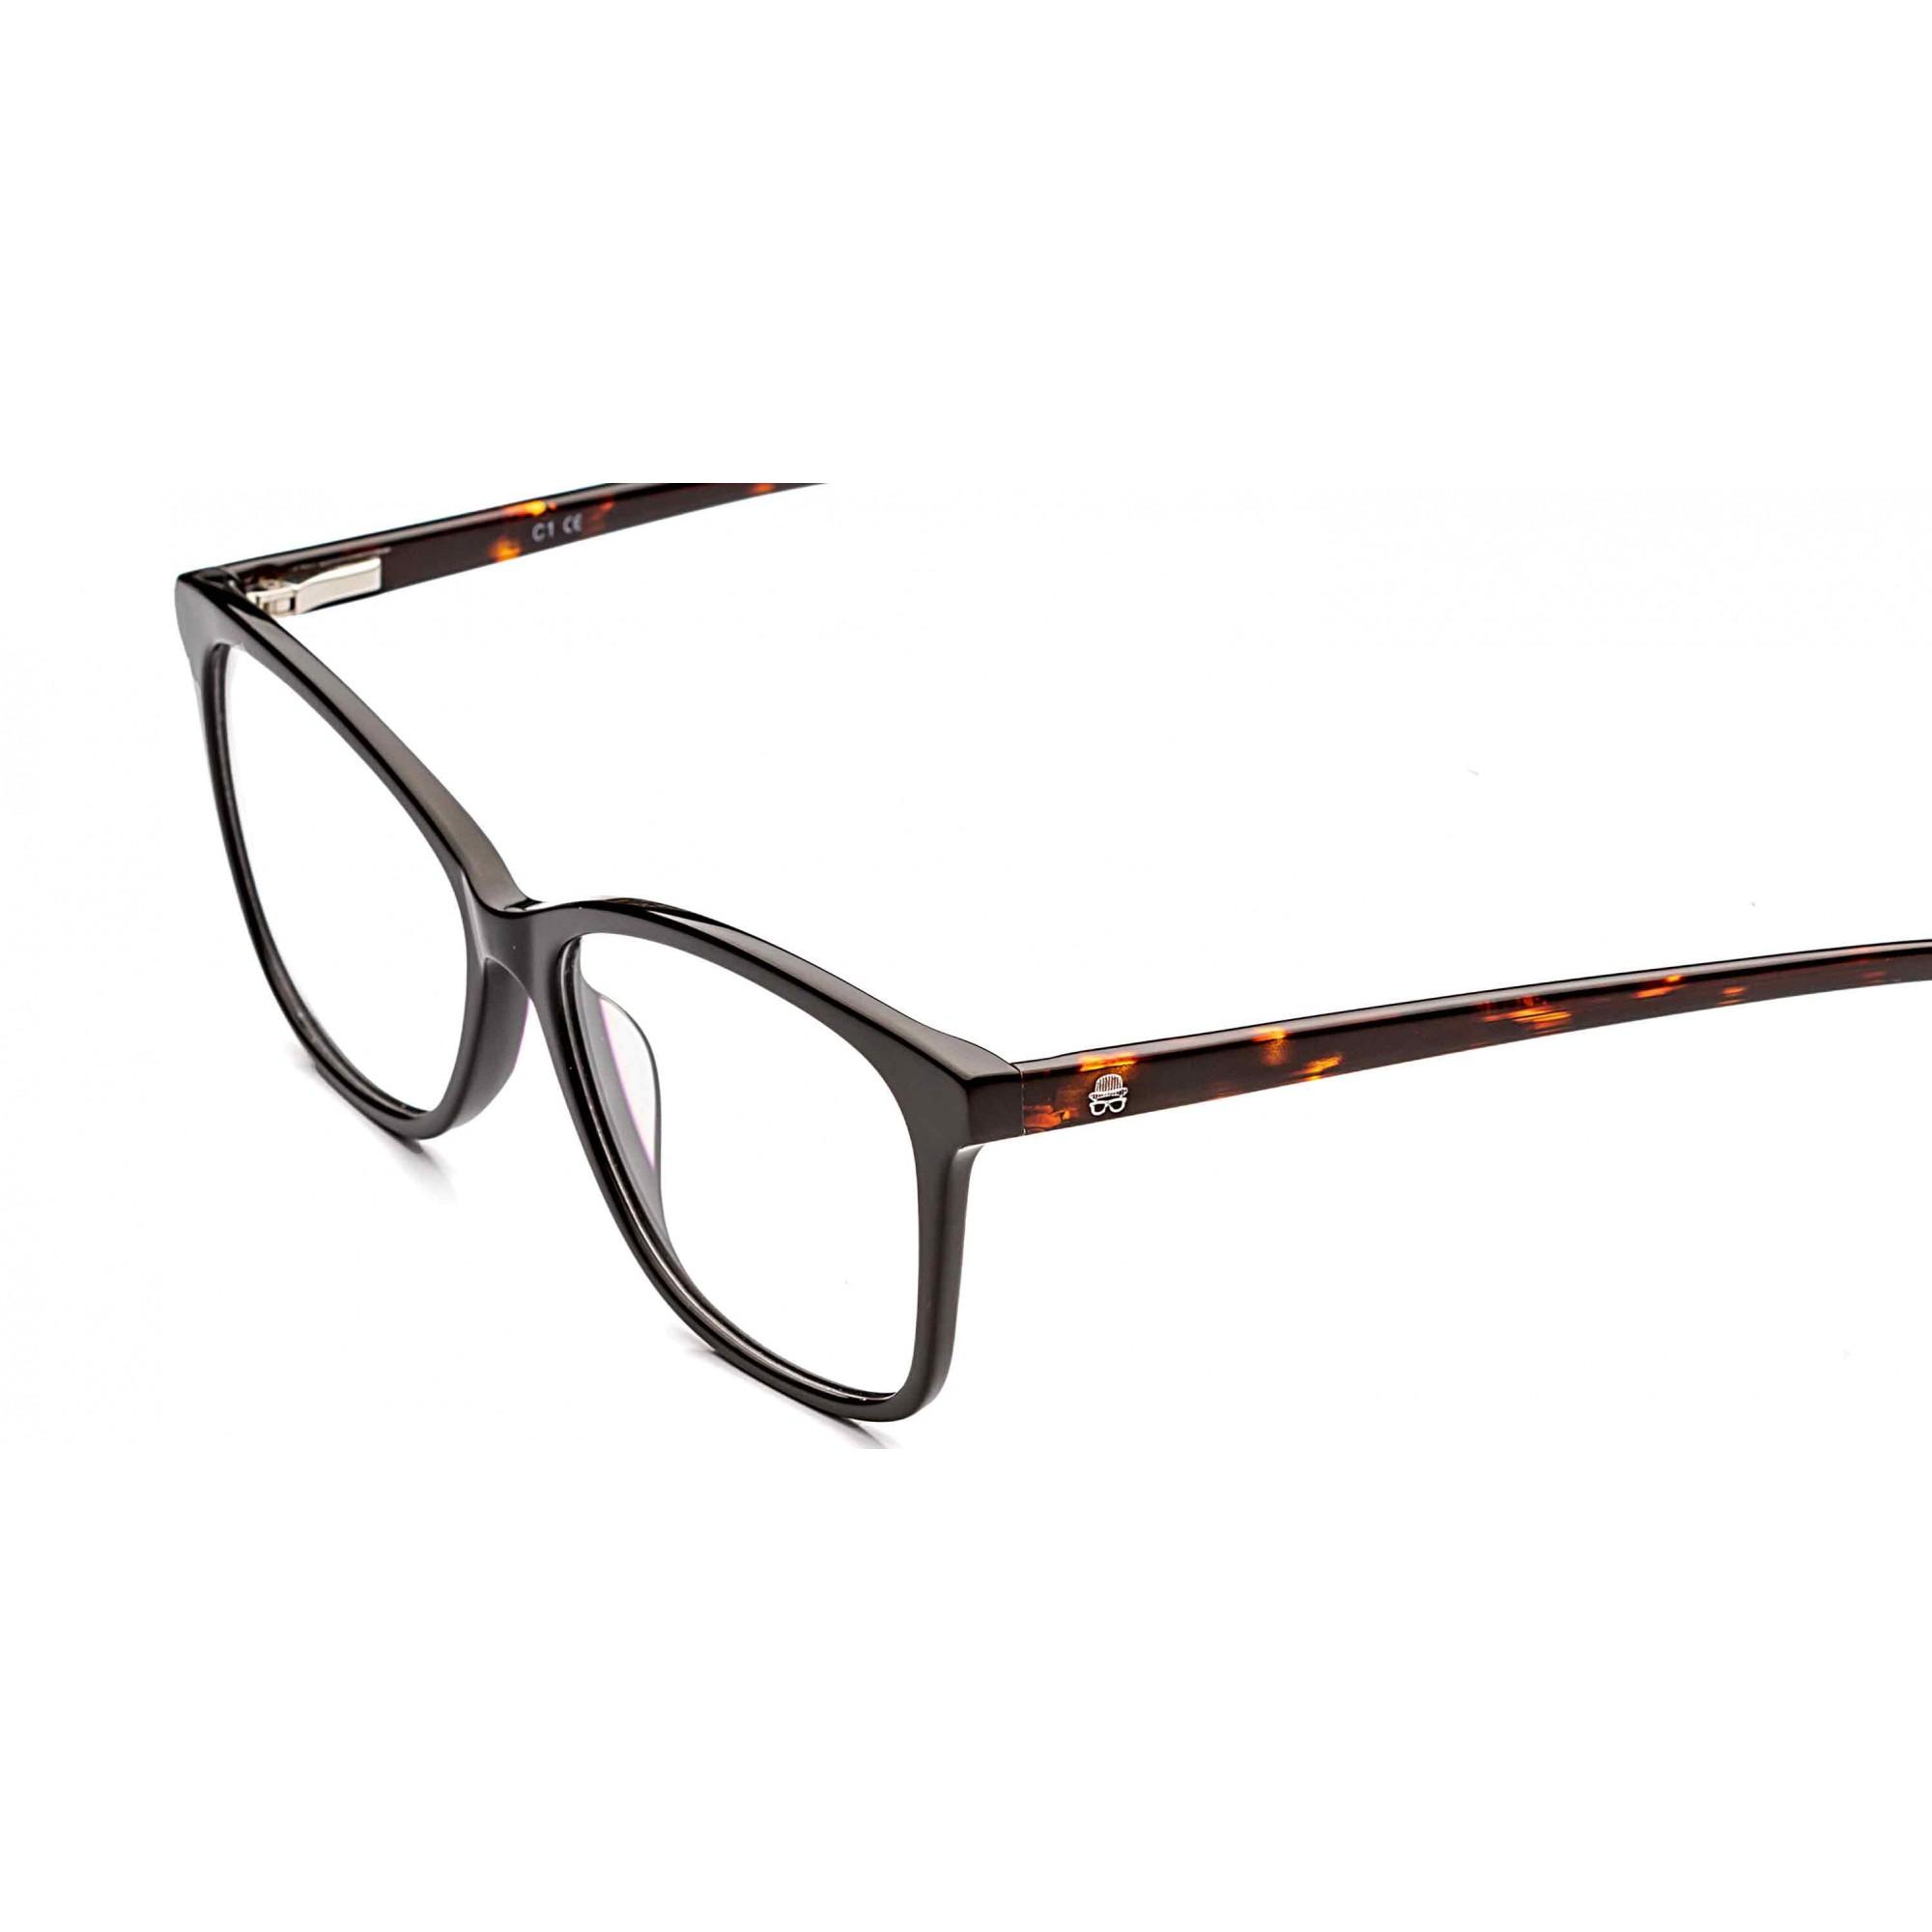 Óculos de Grau Ísis Rafael Lopes Eyewear